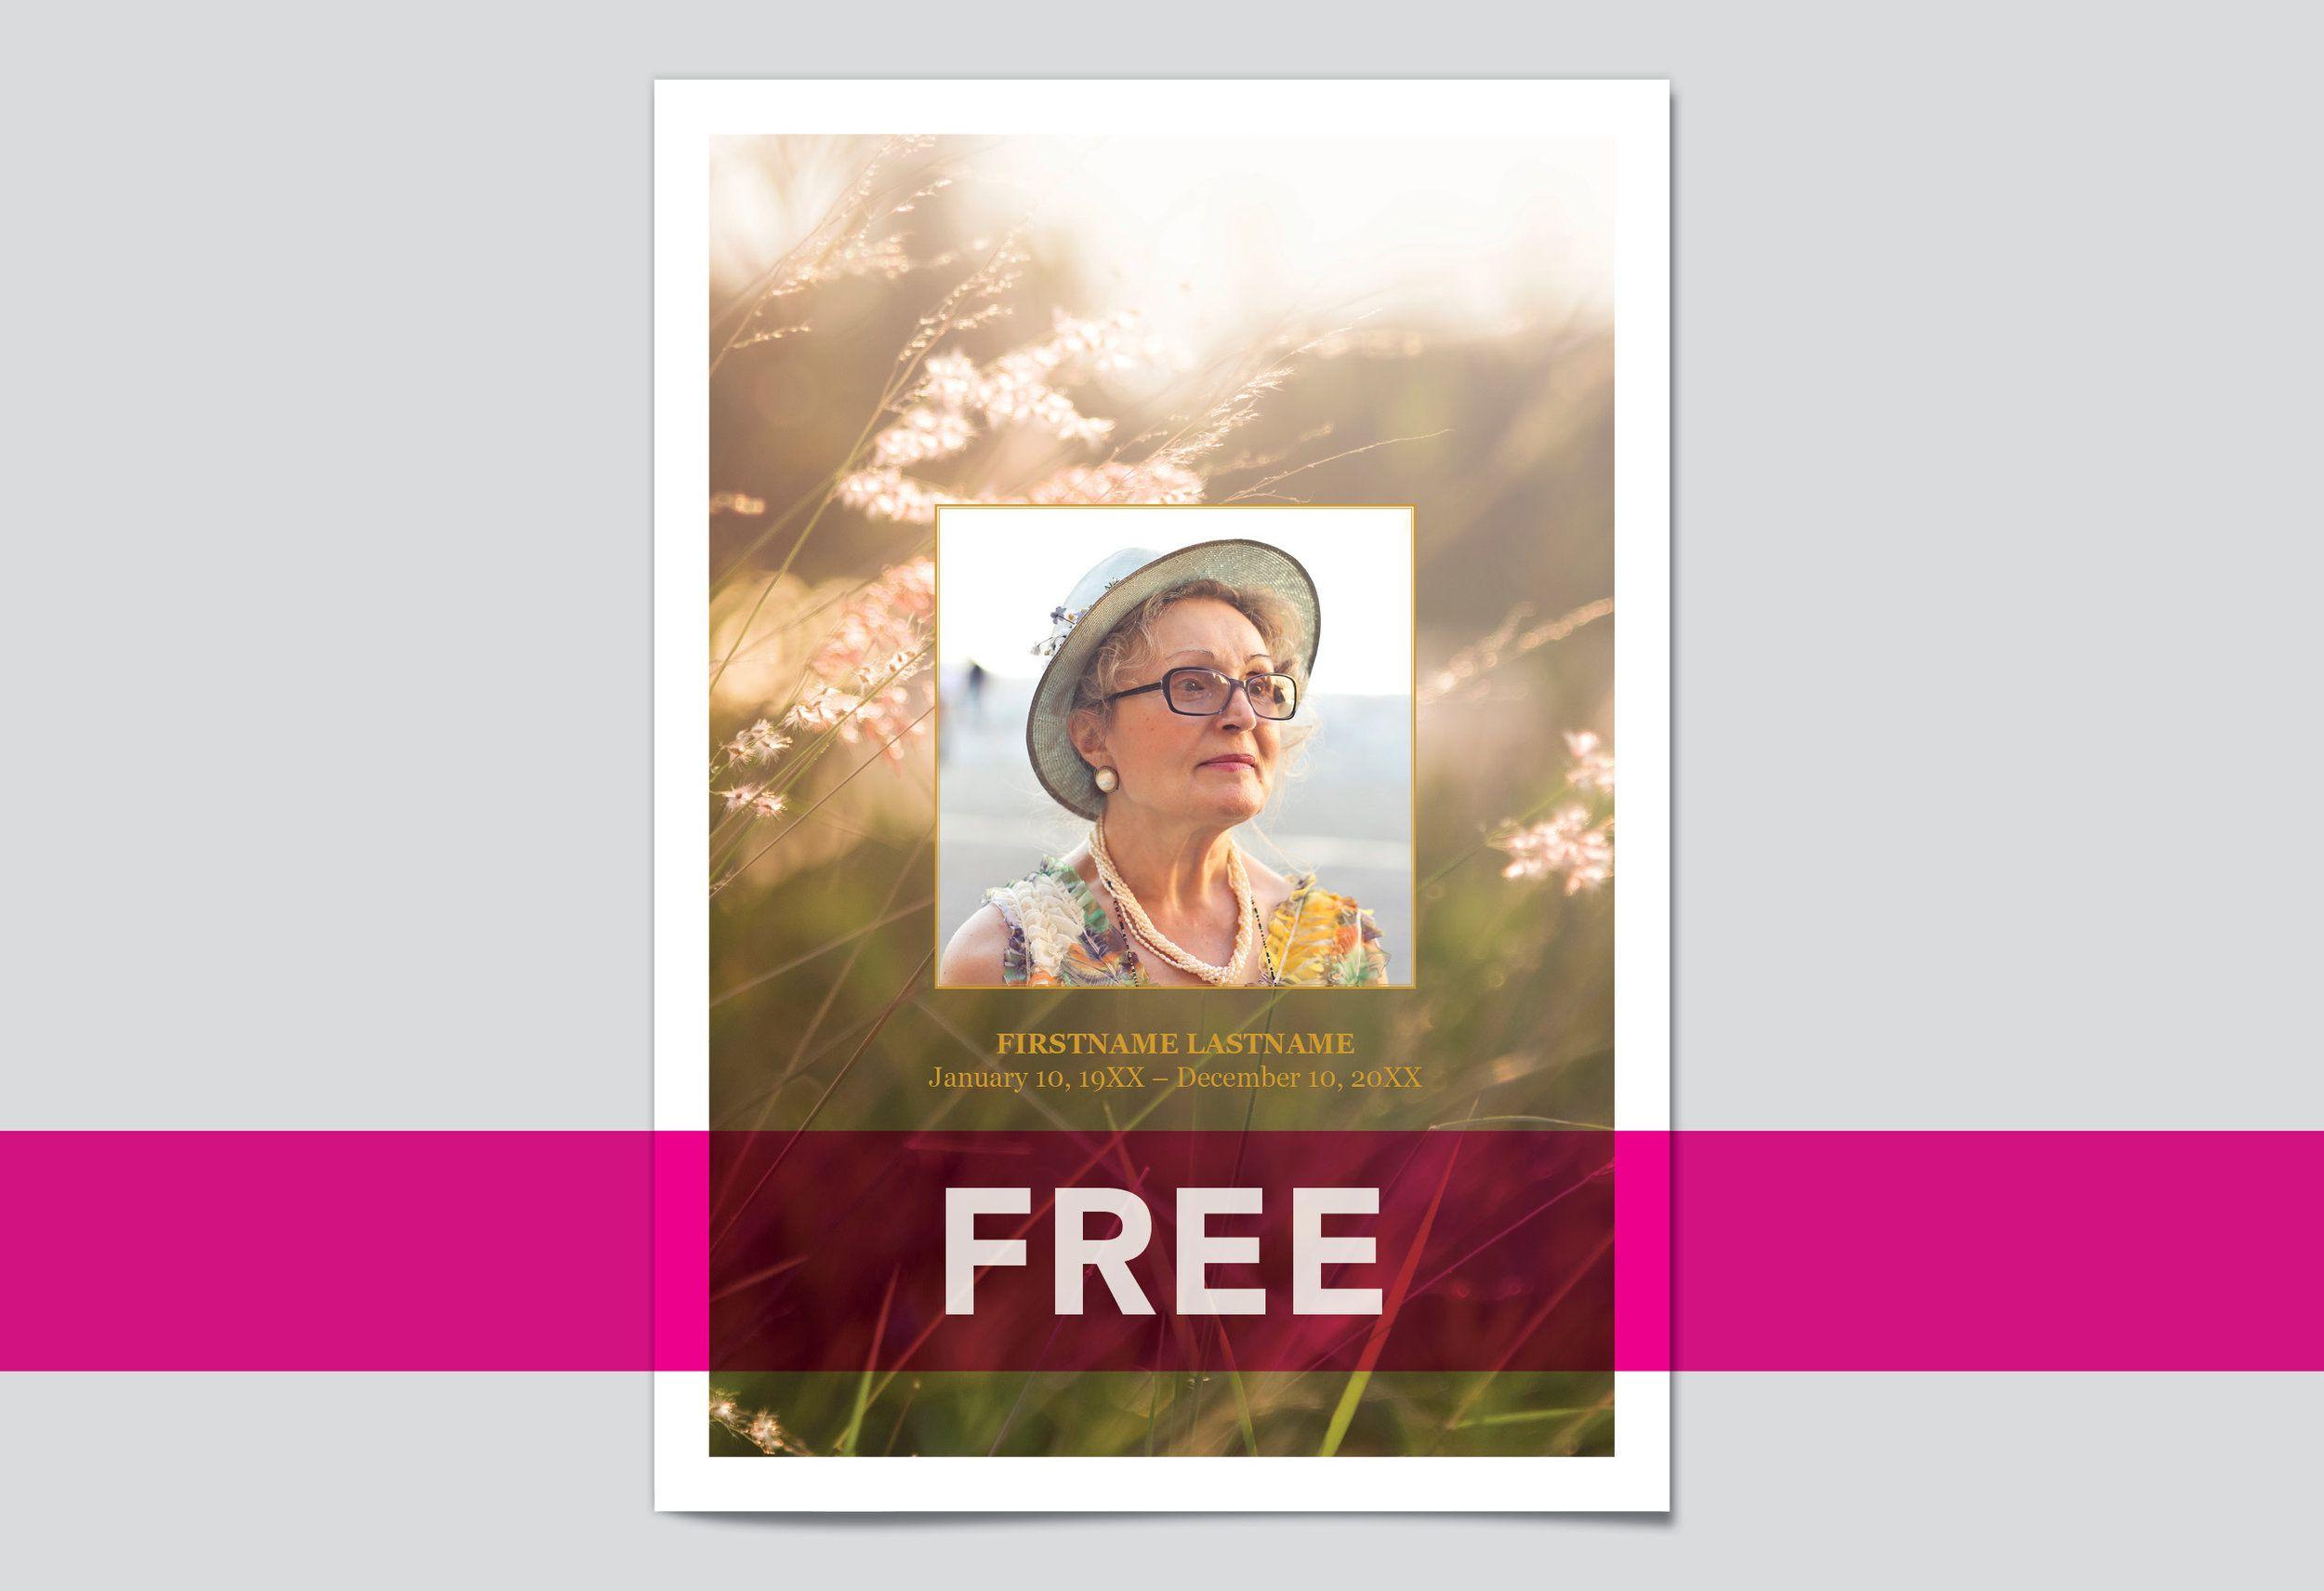 008 Wonderful Free Celebration Of Life Program Template Download Concept Full